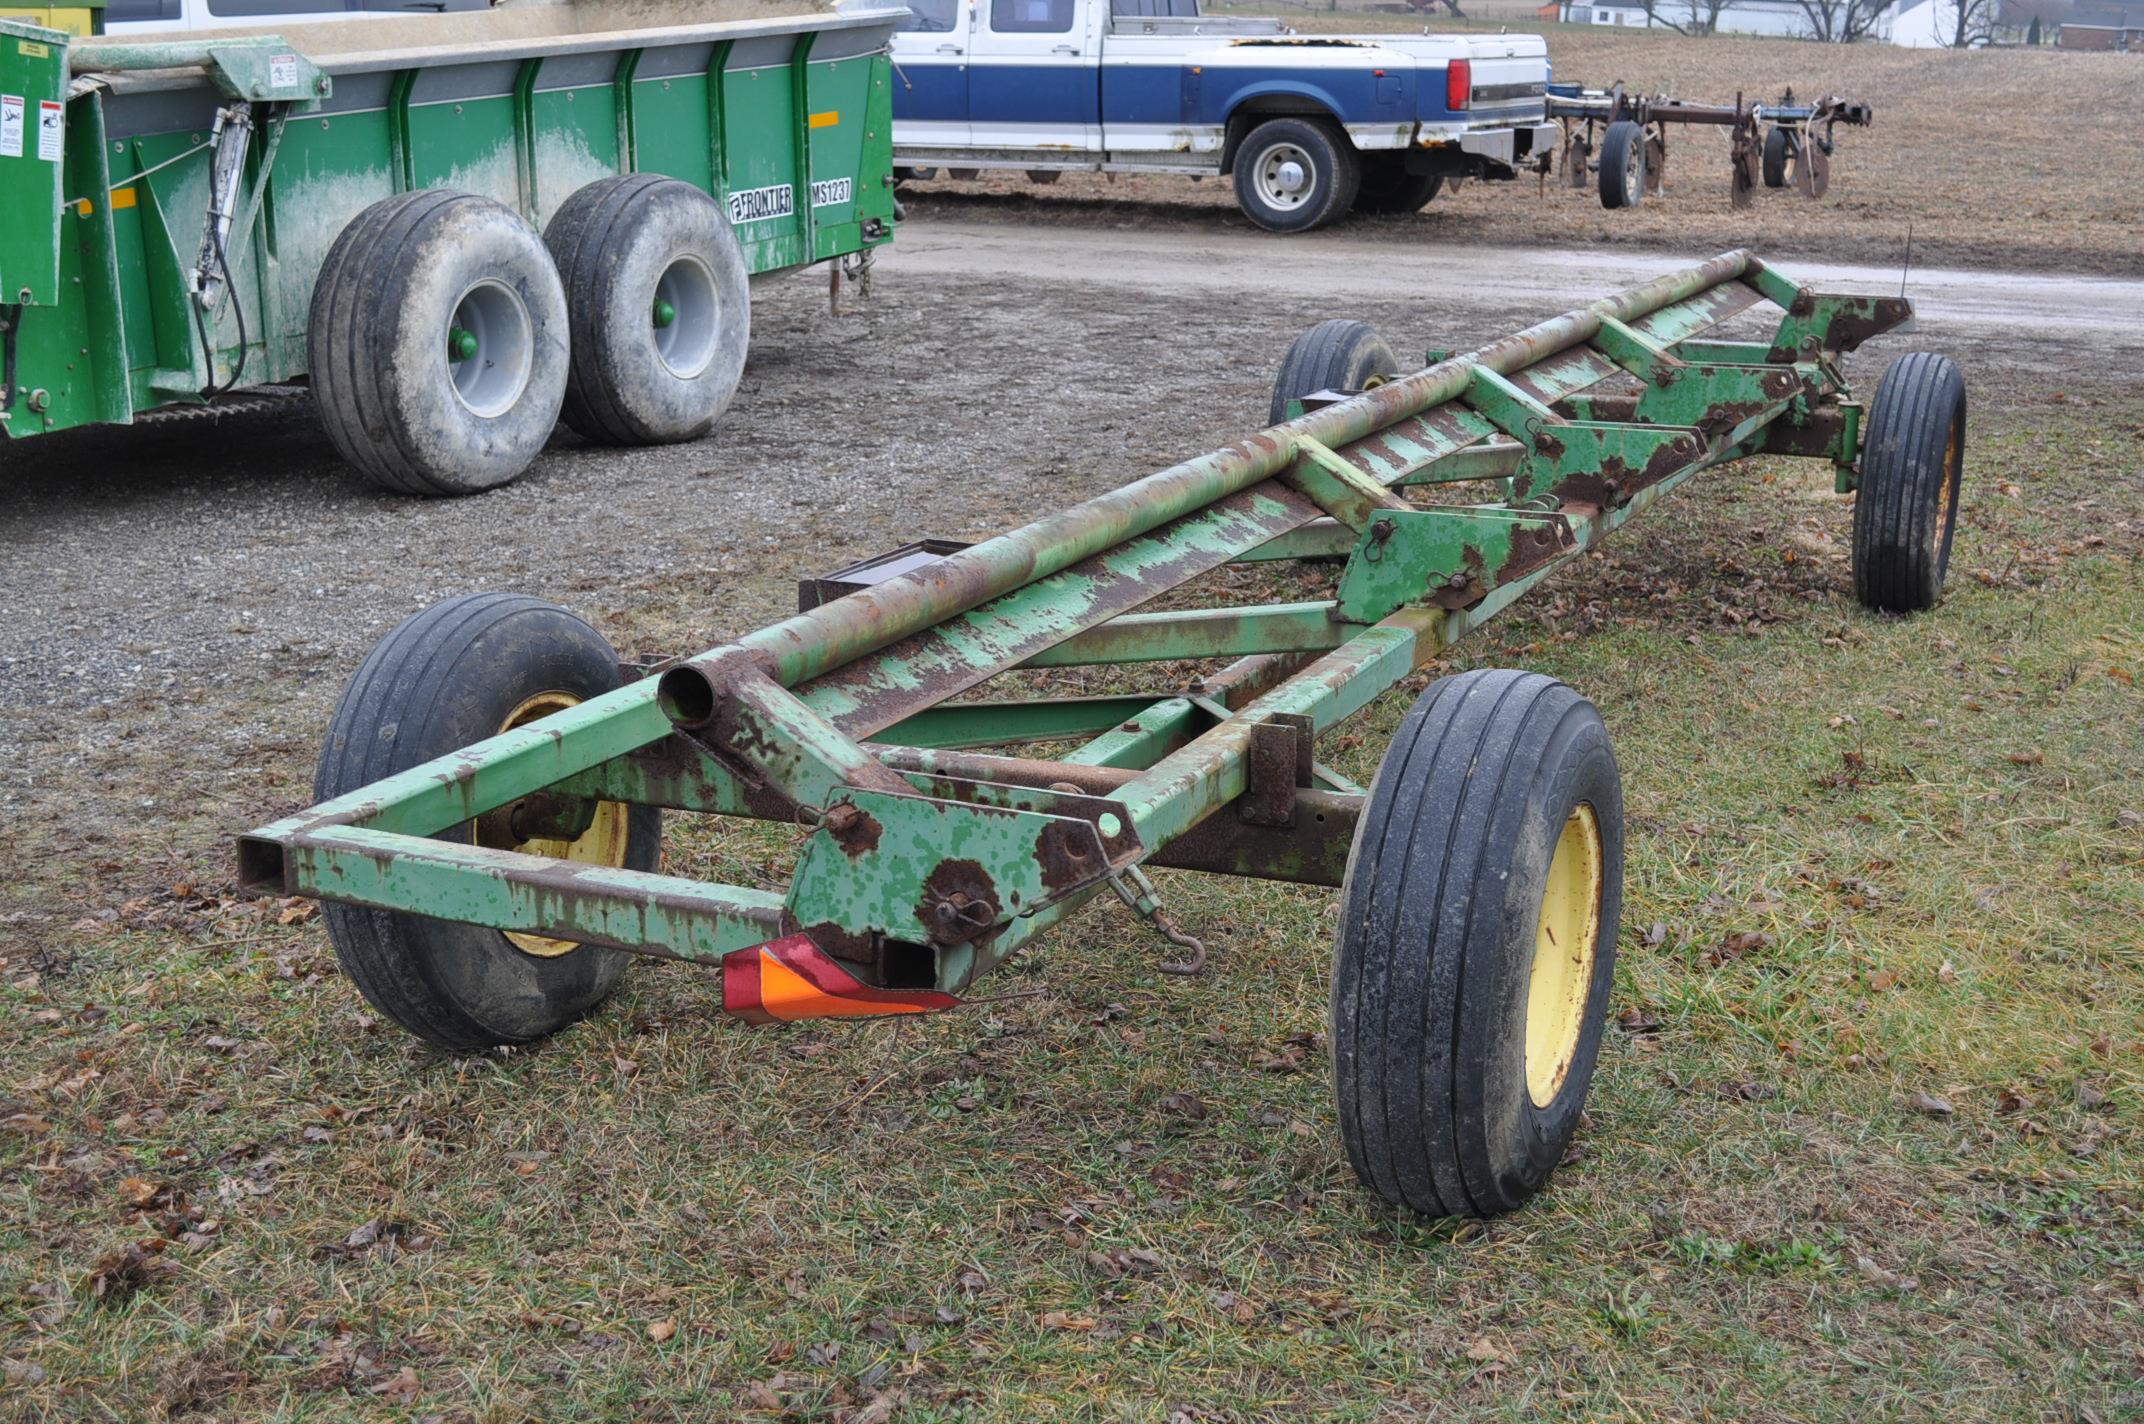 20' John Deere header wagon, 9.5 L-15 tires - Image 4 of 5